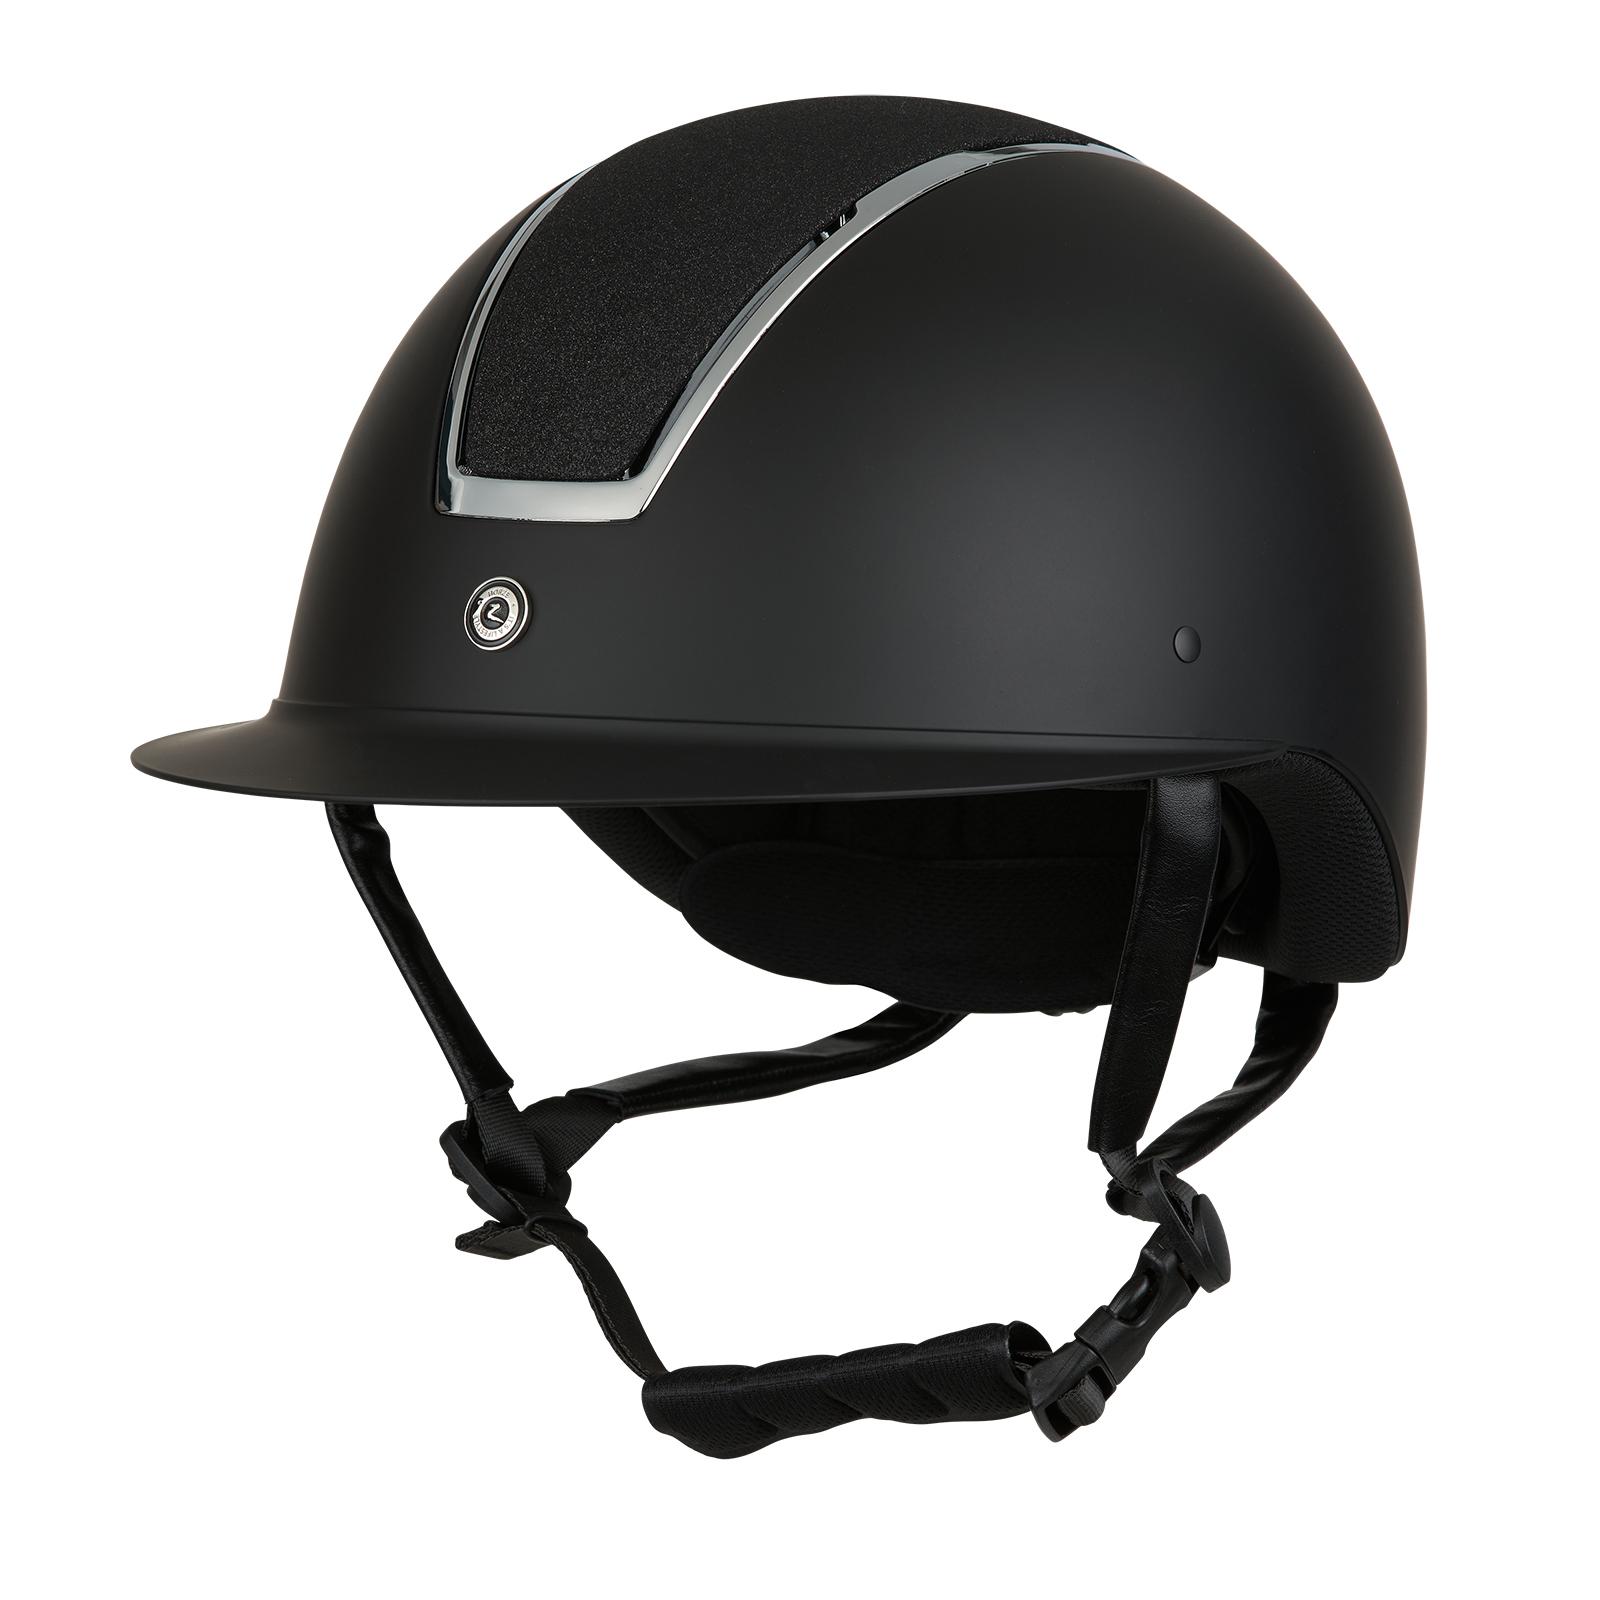 Monarch helmet BL